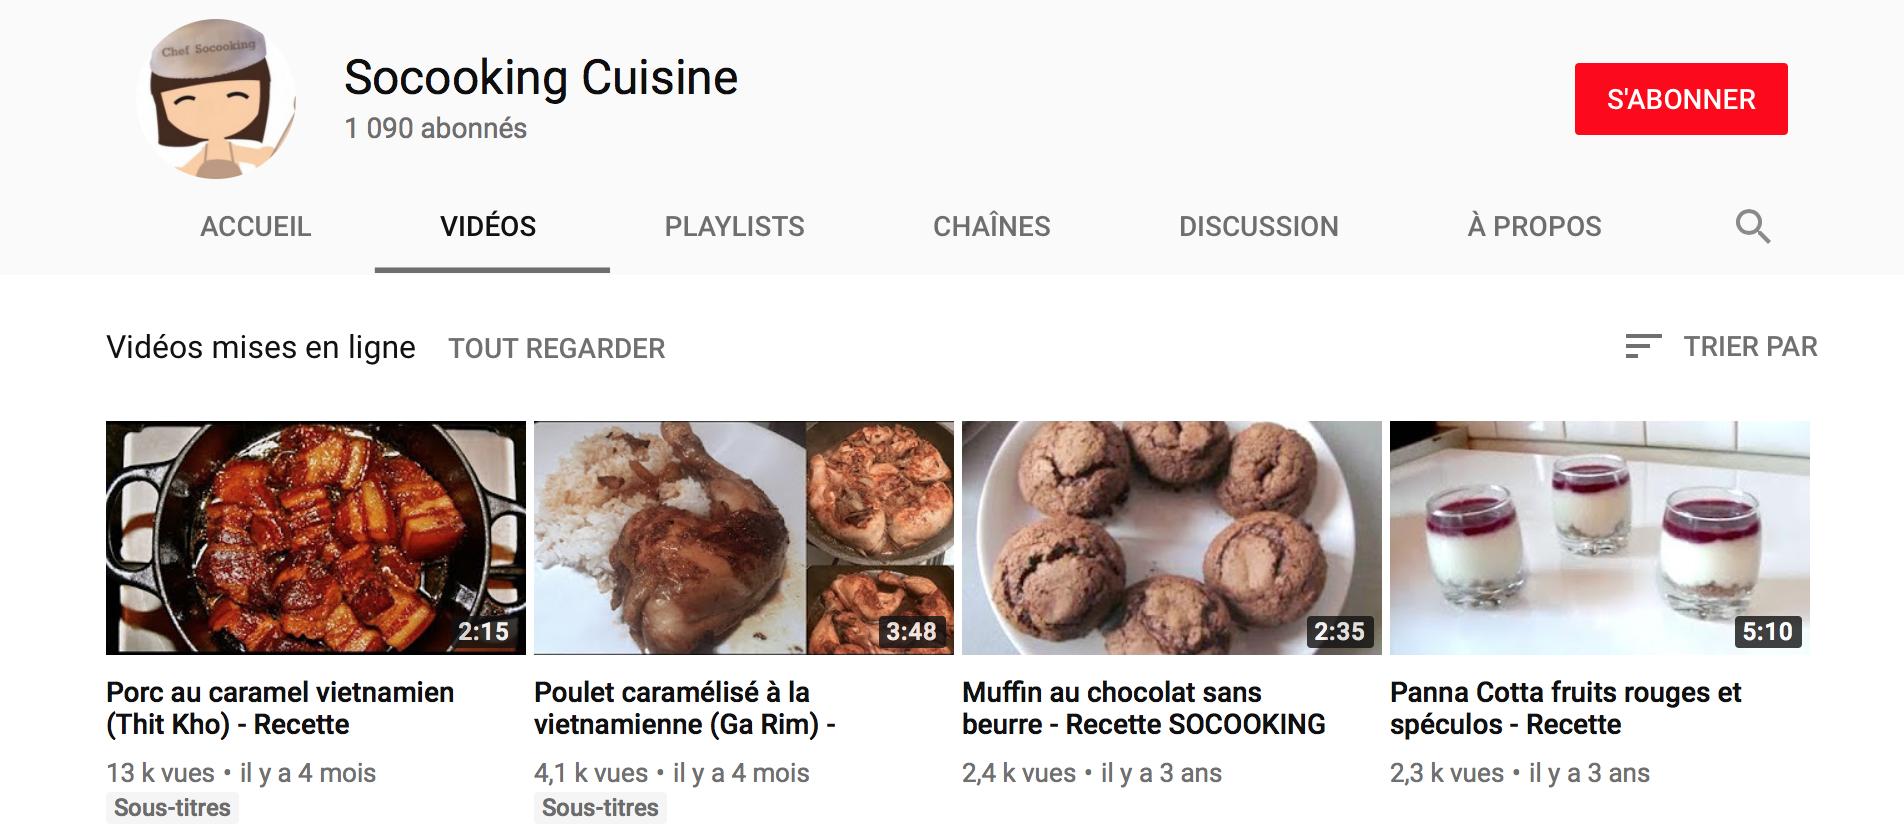 Chaine youtube socooking cuisine